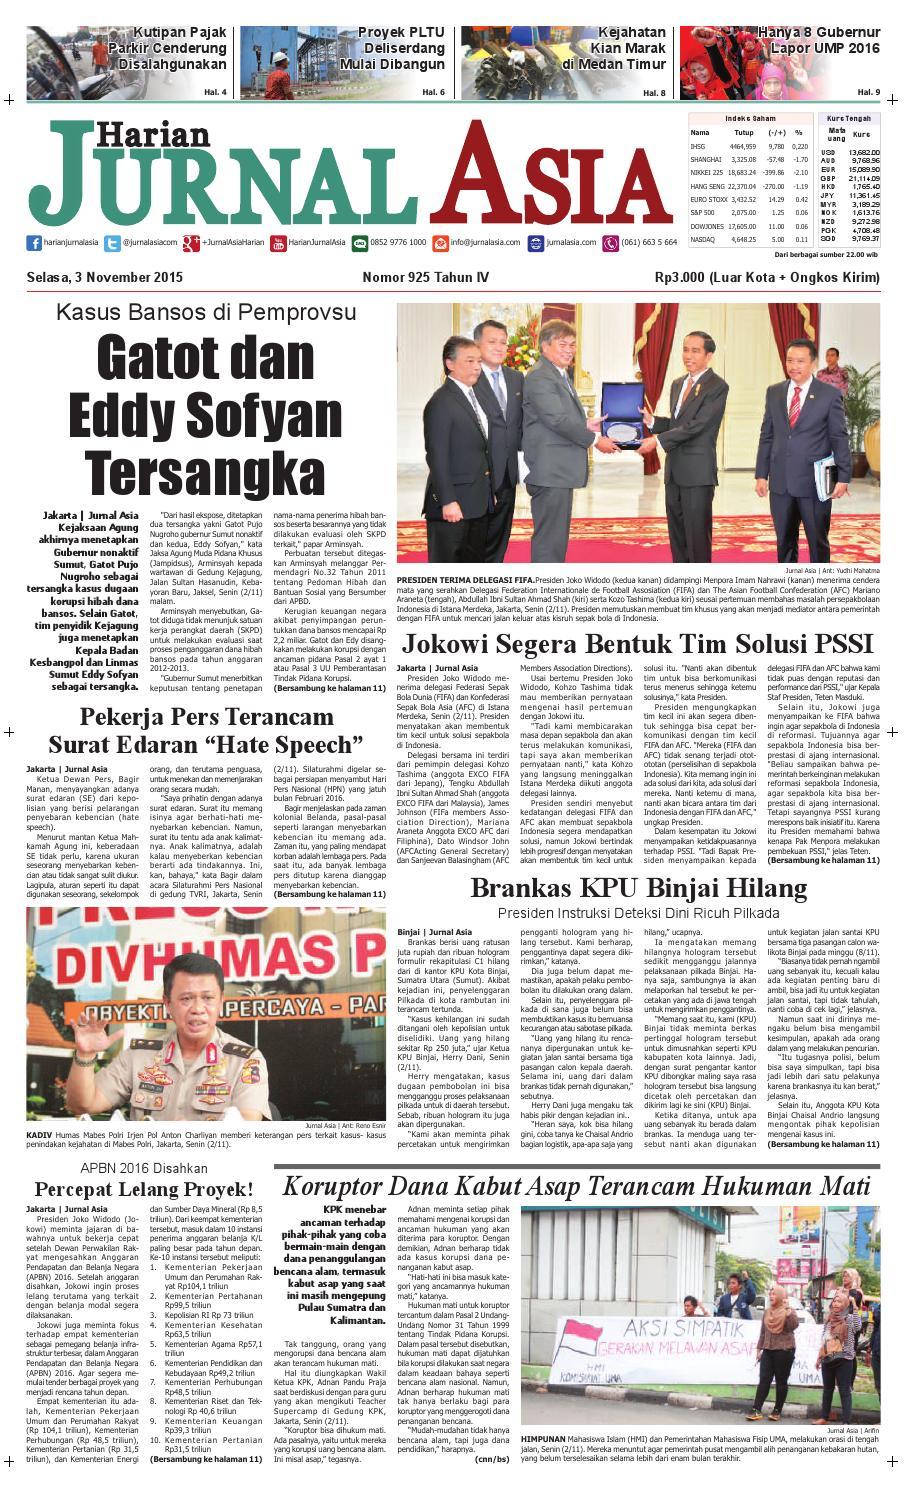 Harian Jurnal Asia Edisi Selasa 03 November 2015 By Produk Ukm Bumn Kue Sagu Ikan Haruan Medan Issuu